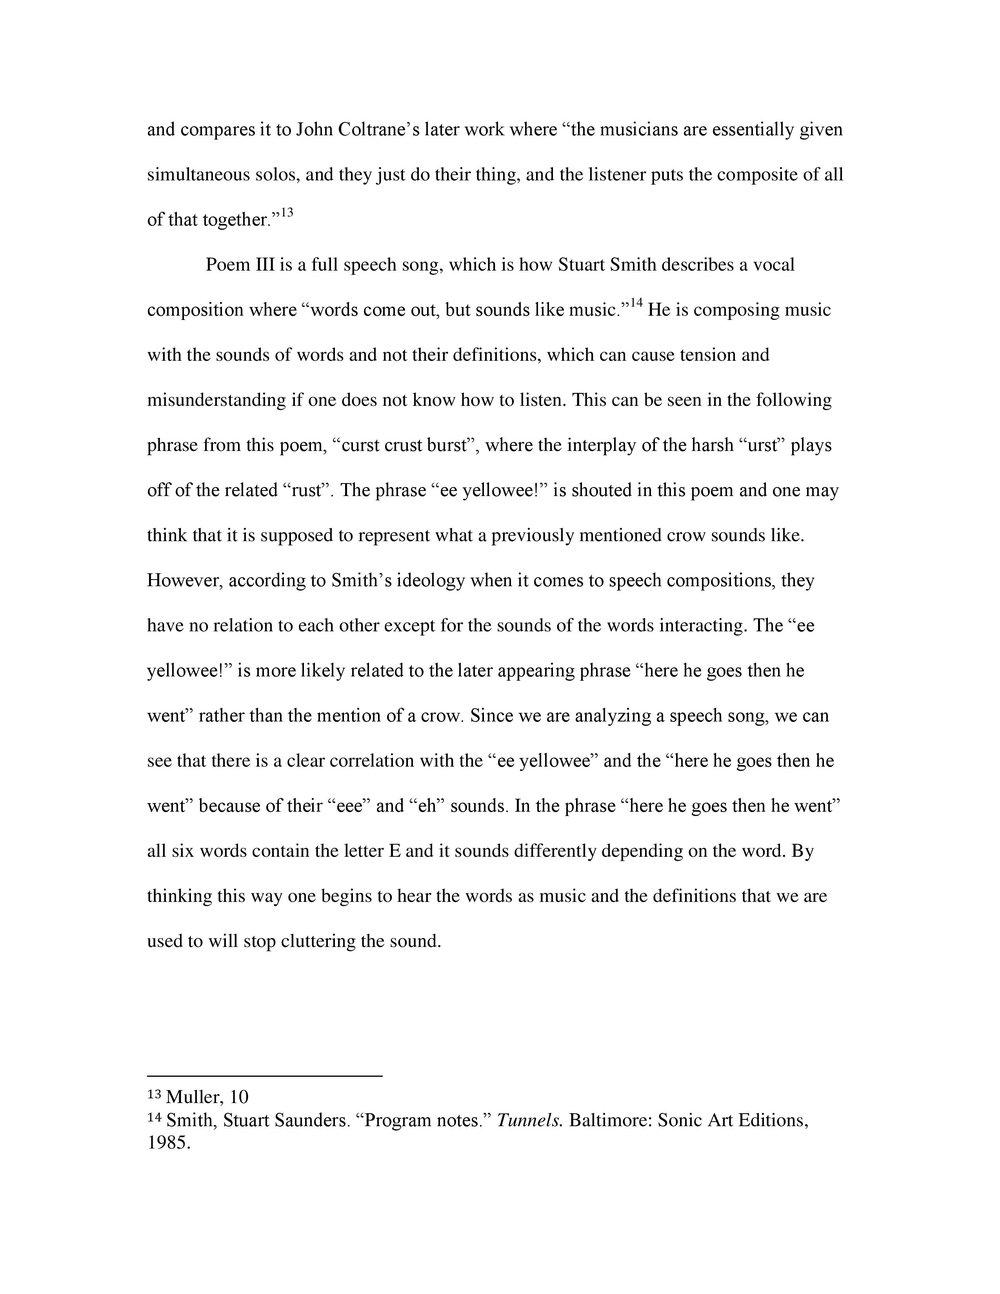 Smith Talk-page-005.jpg